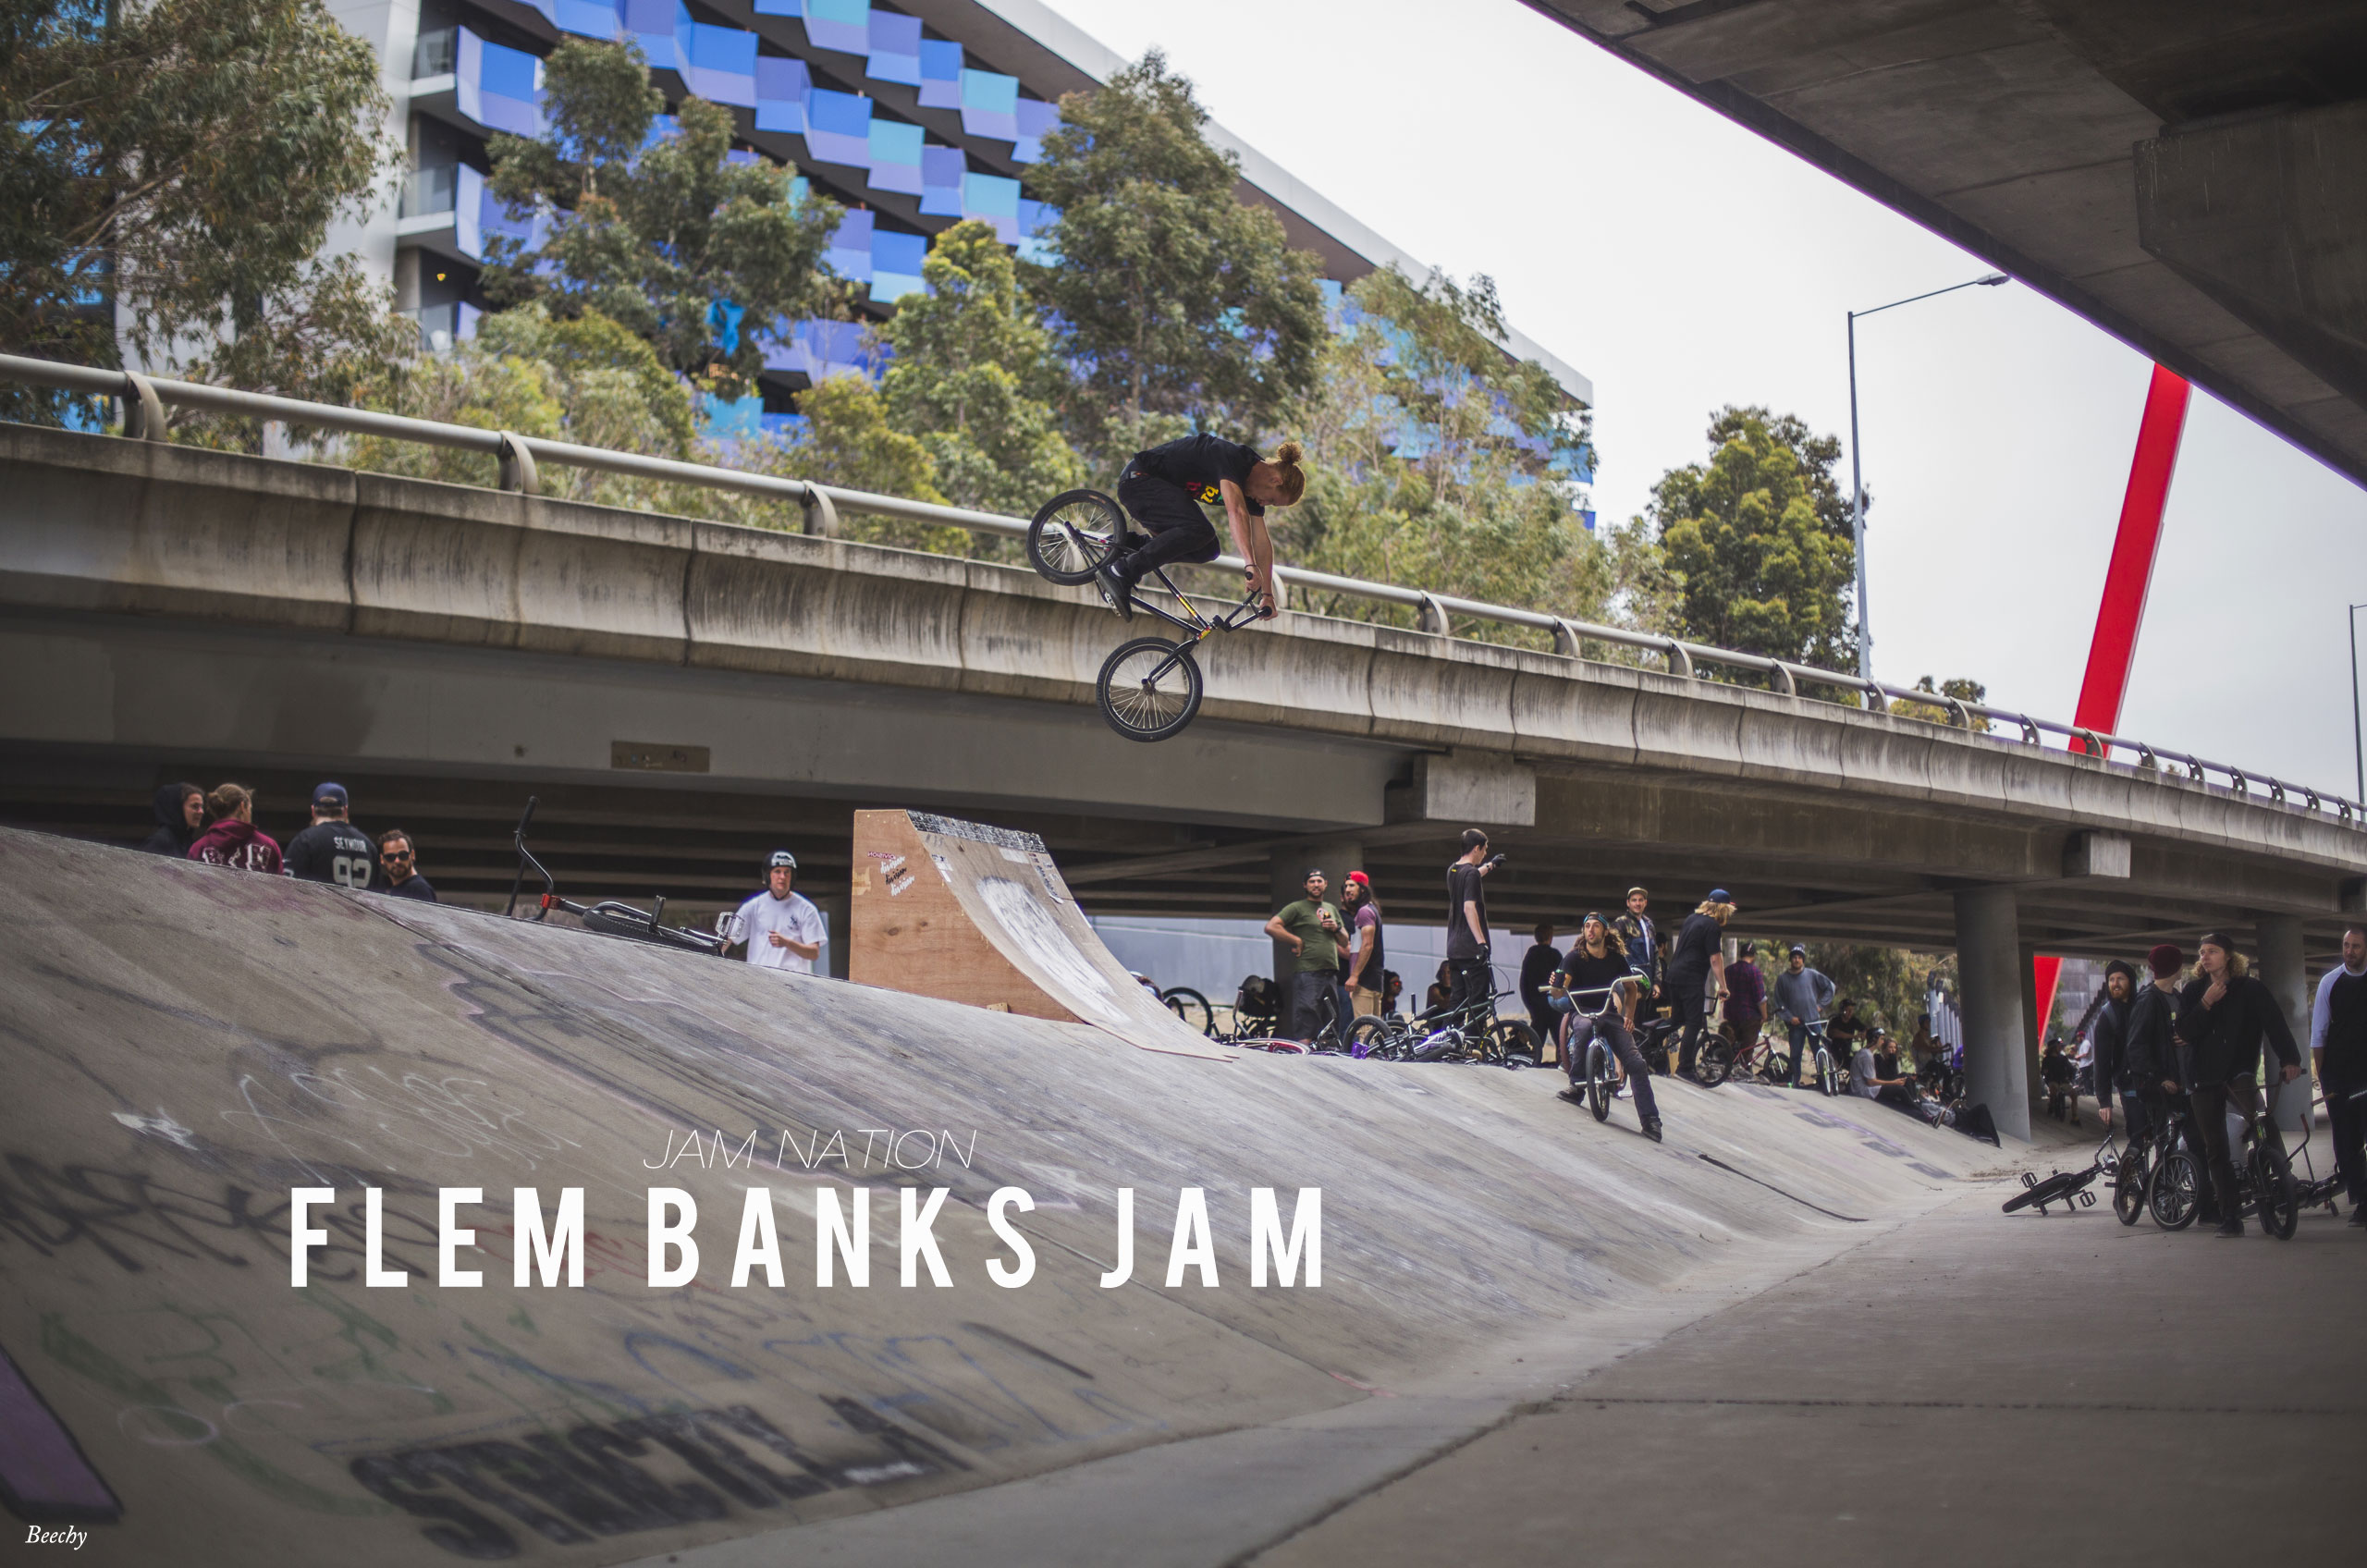 Jamnation – Flem Banks Jam 2014